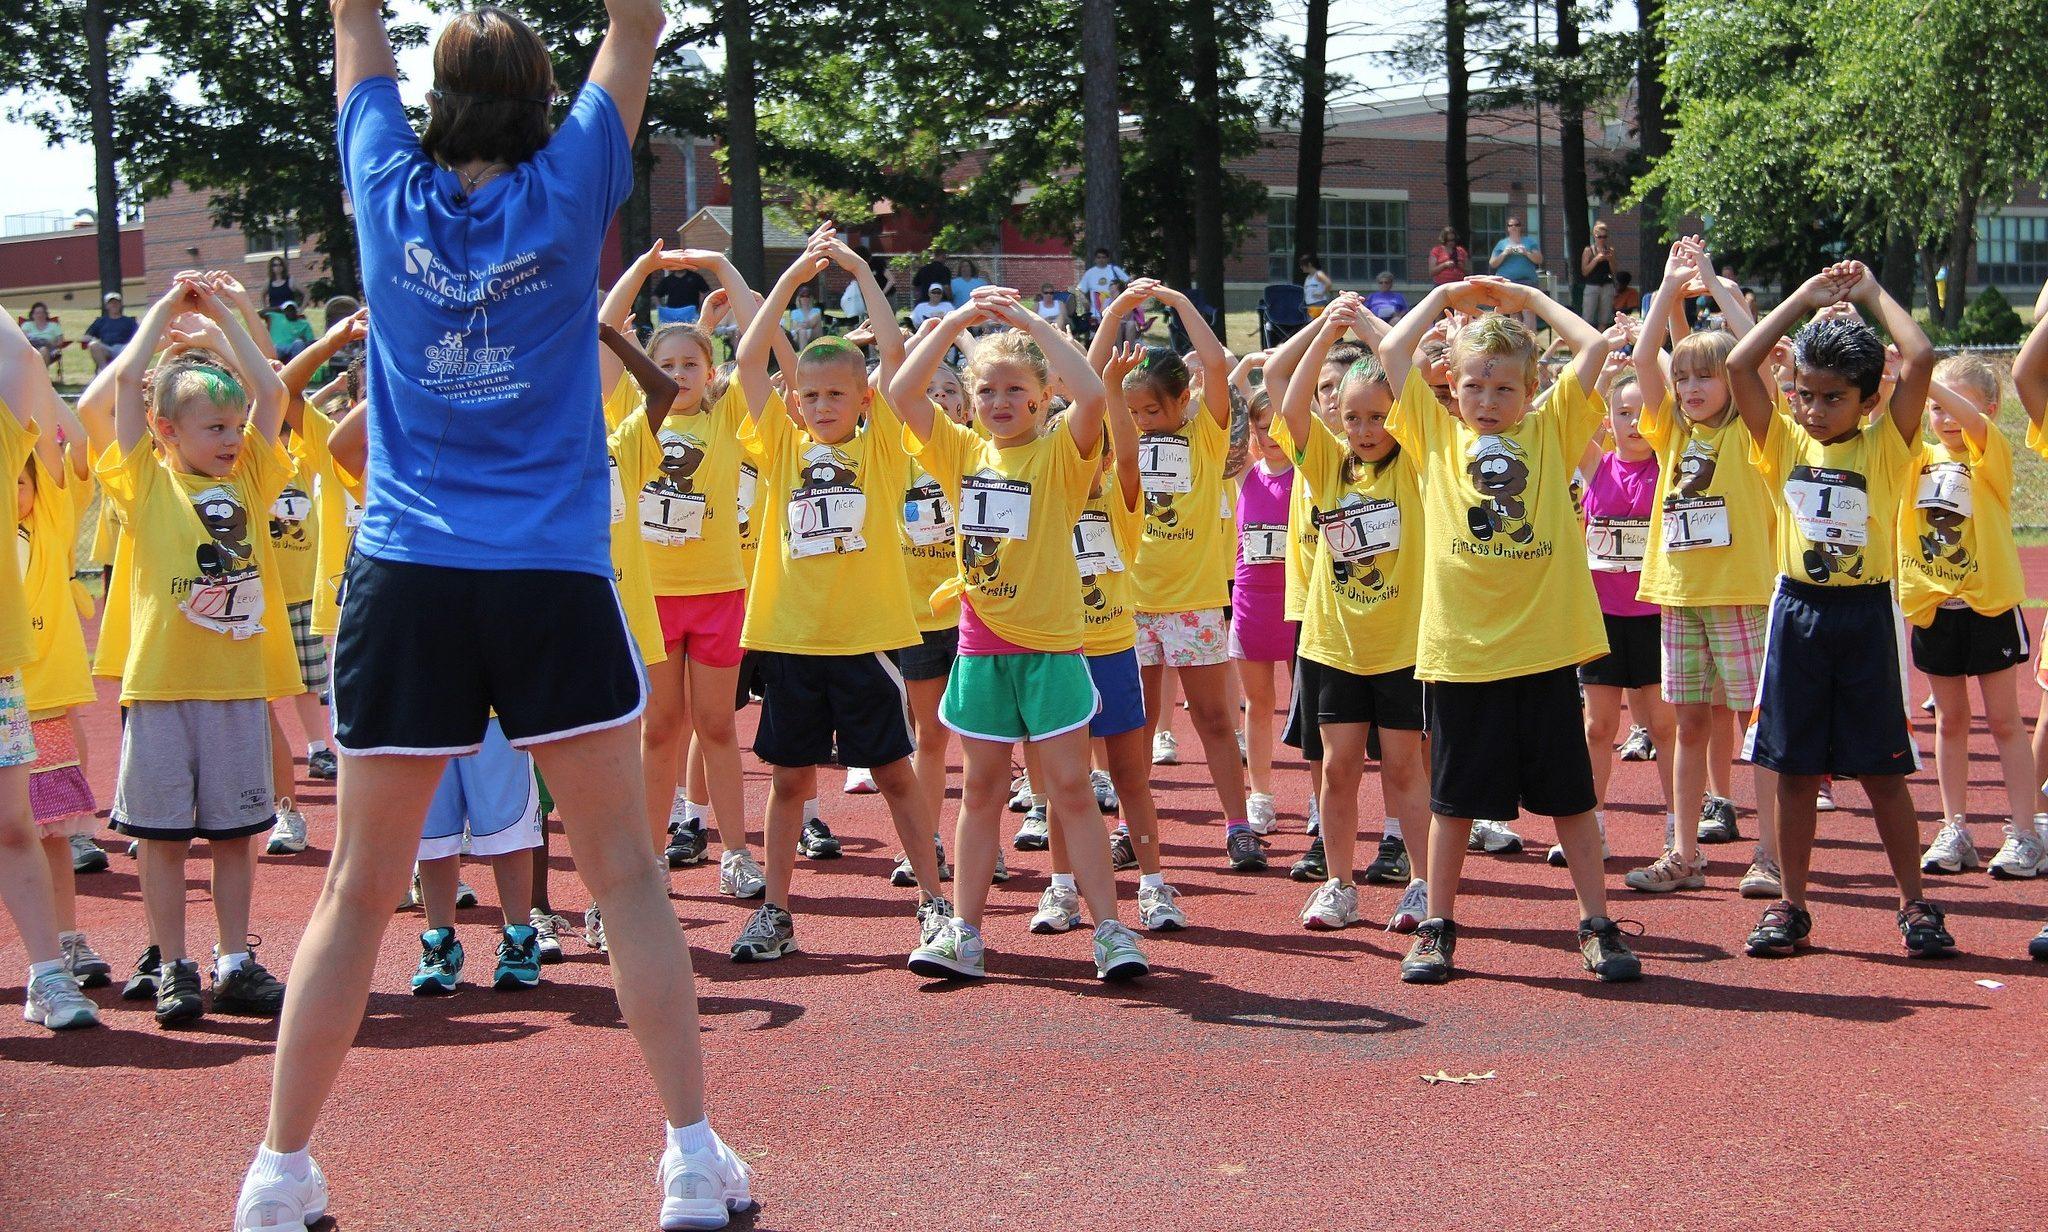 Kids warming up at Fitness University